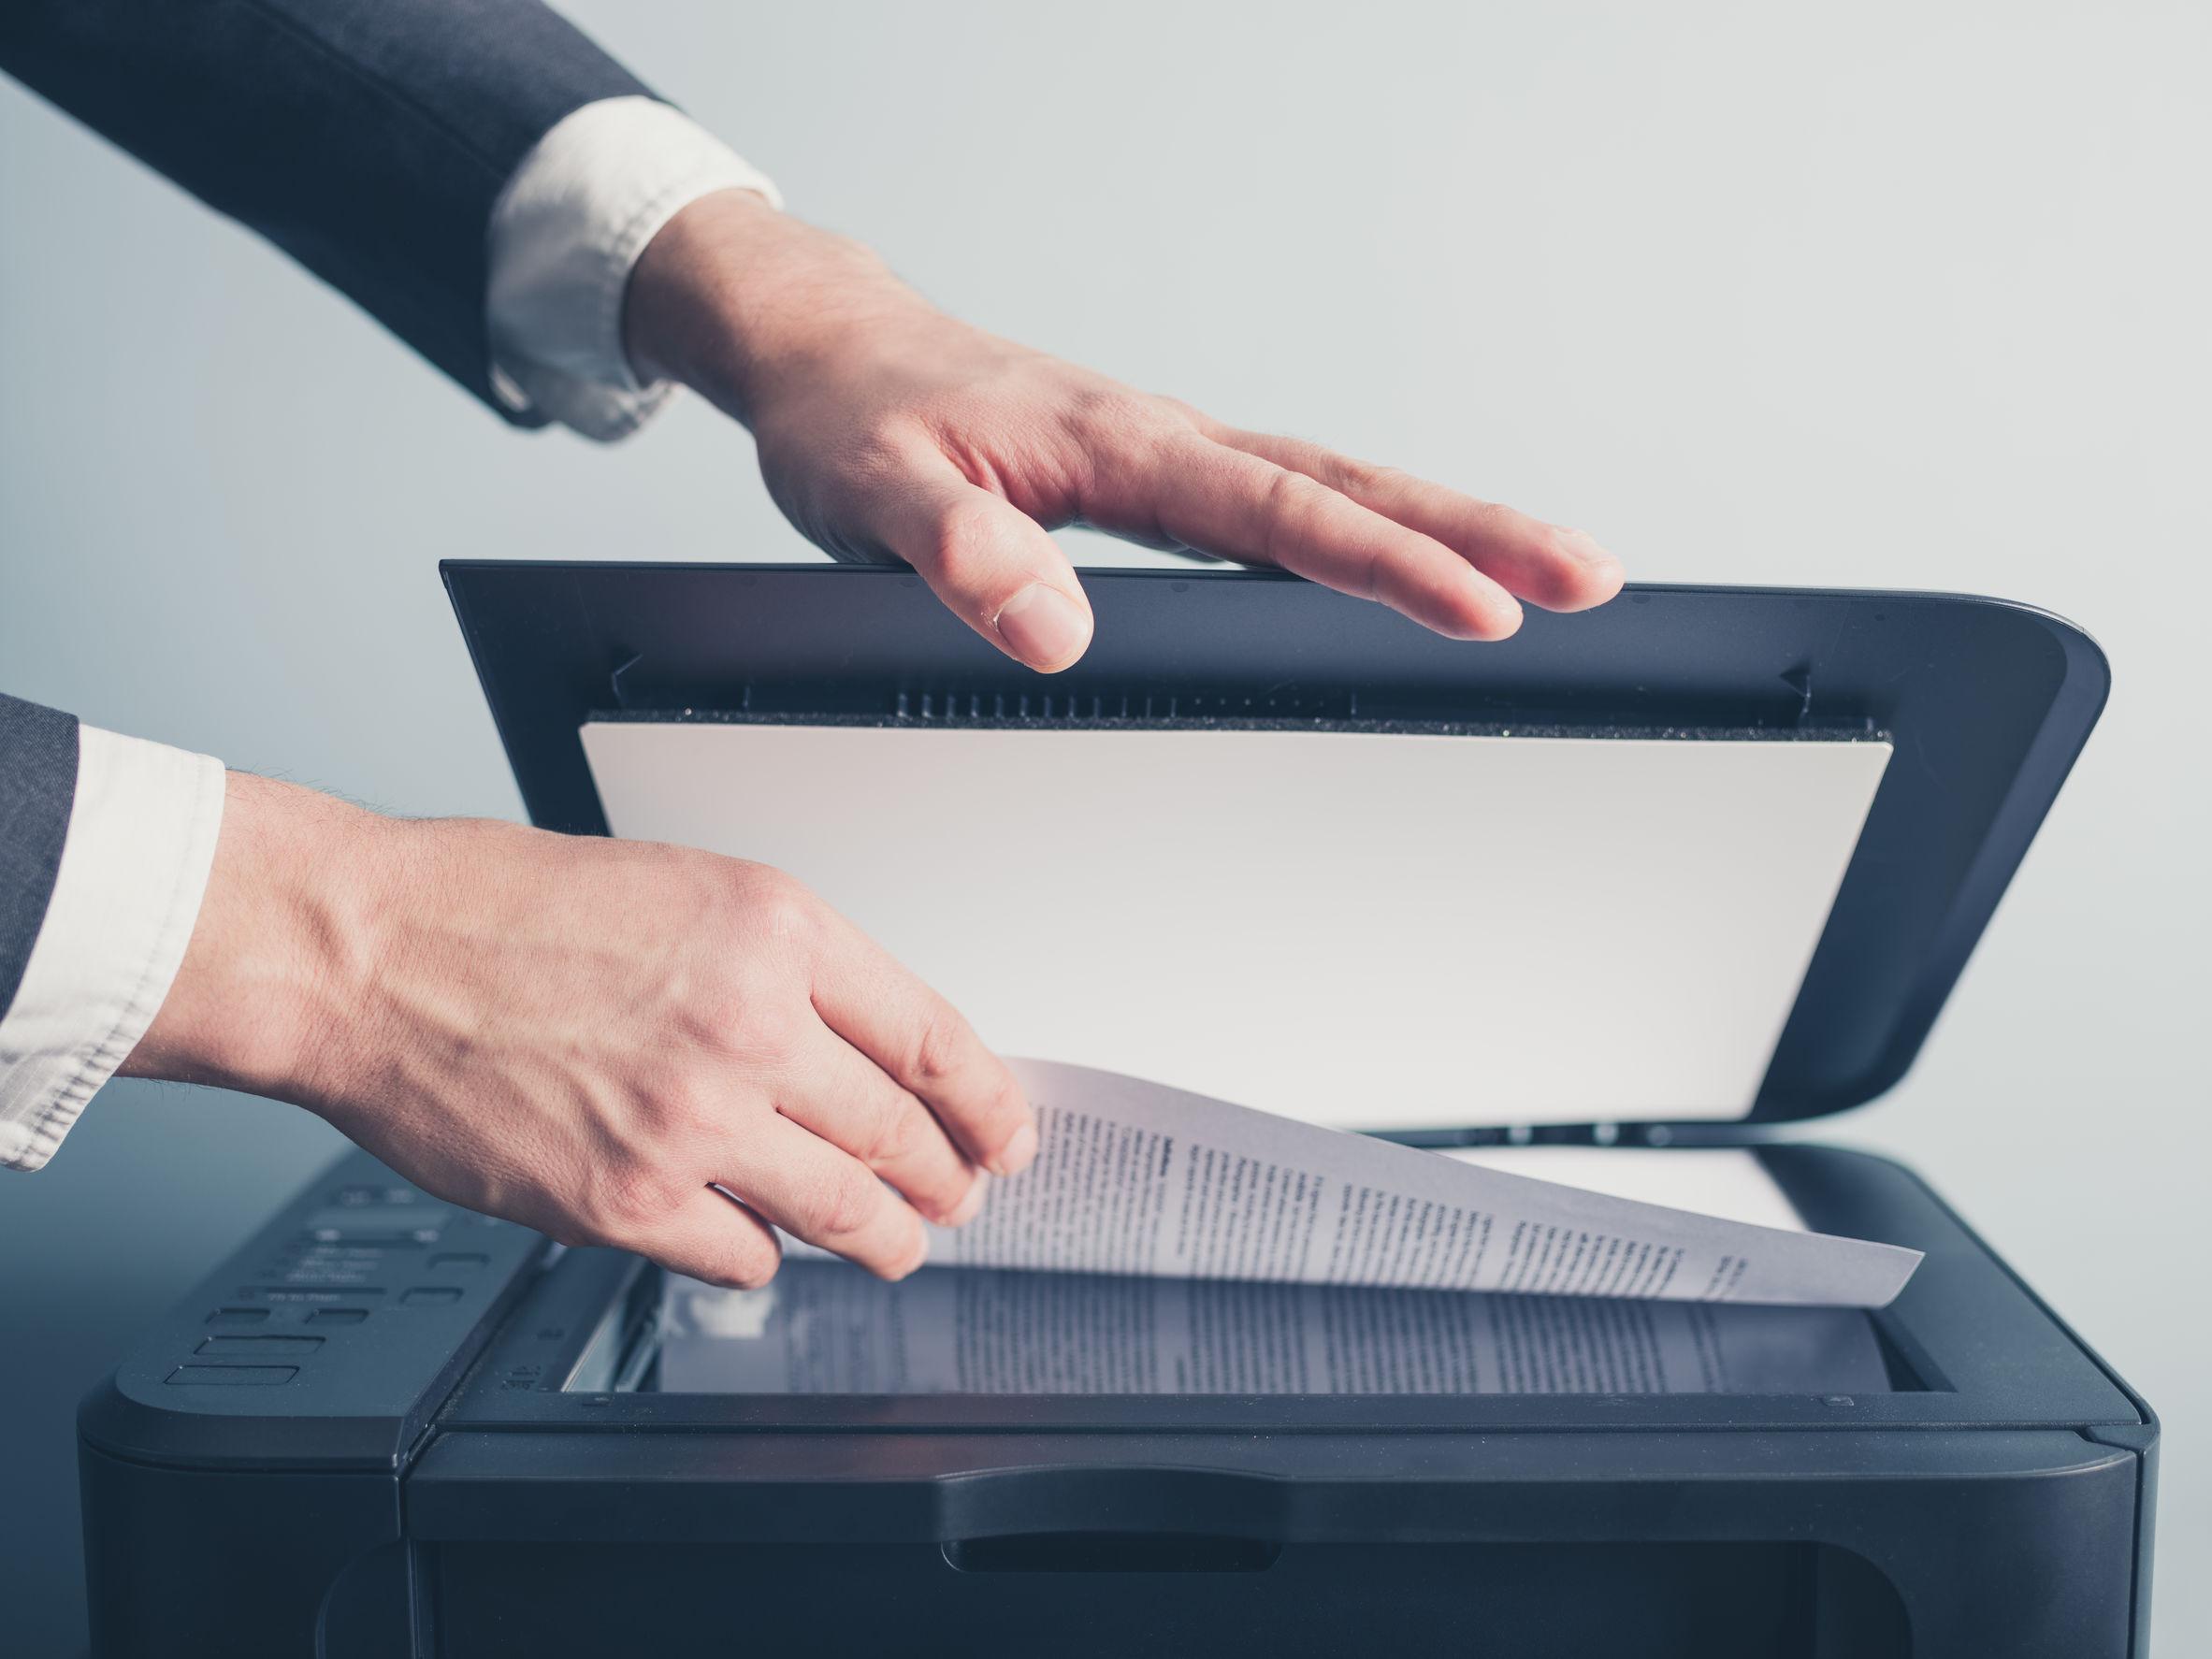 Scanner de documentos